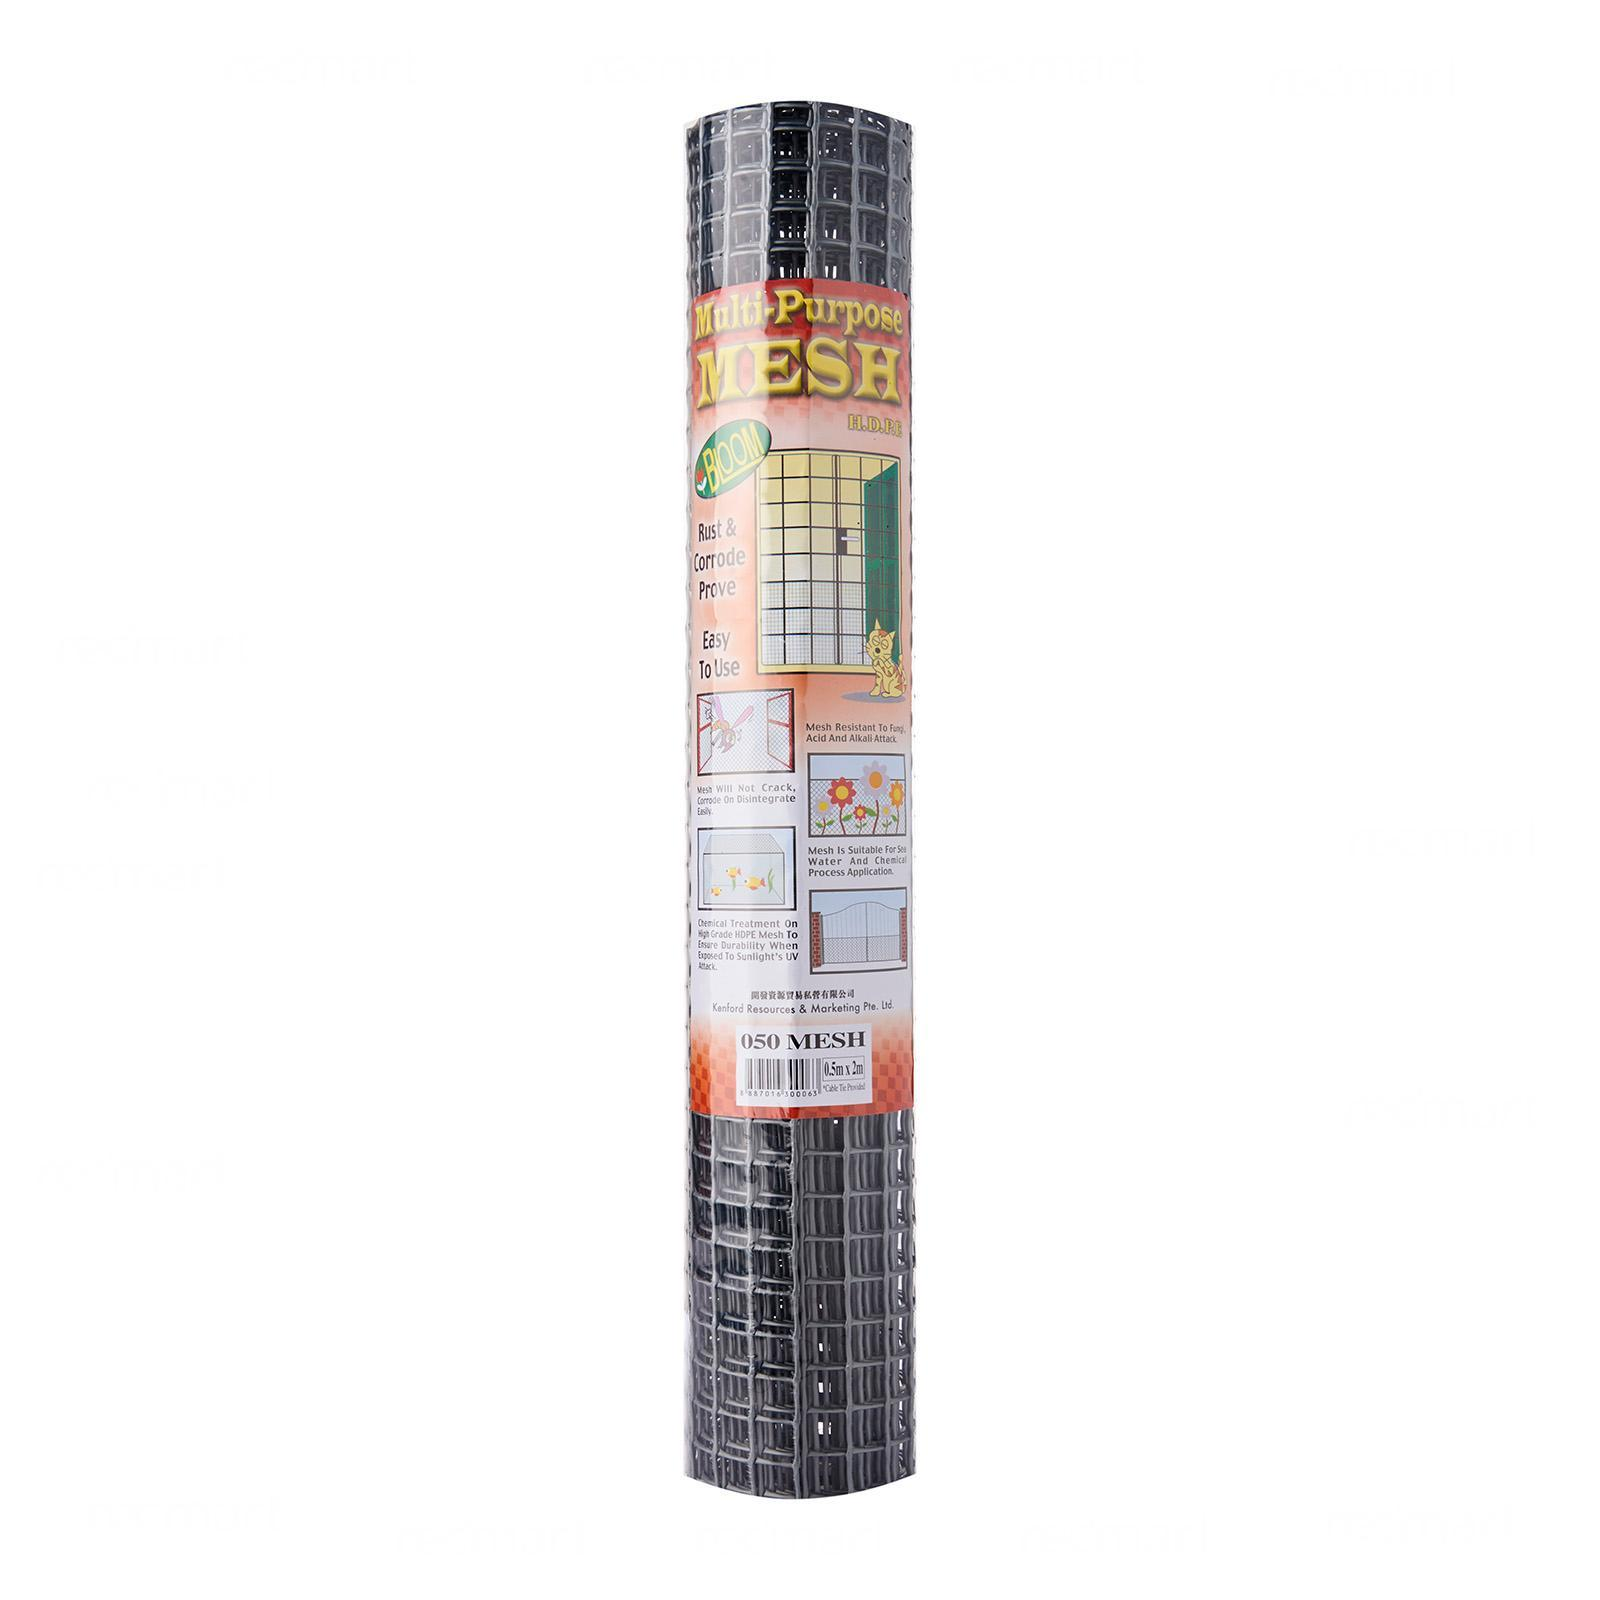 Bloom Multi-Purpose Mesh 2x0.5m - 14mm (Rectangular)(Grey)